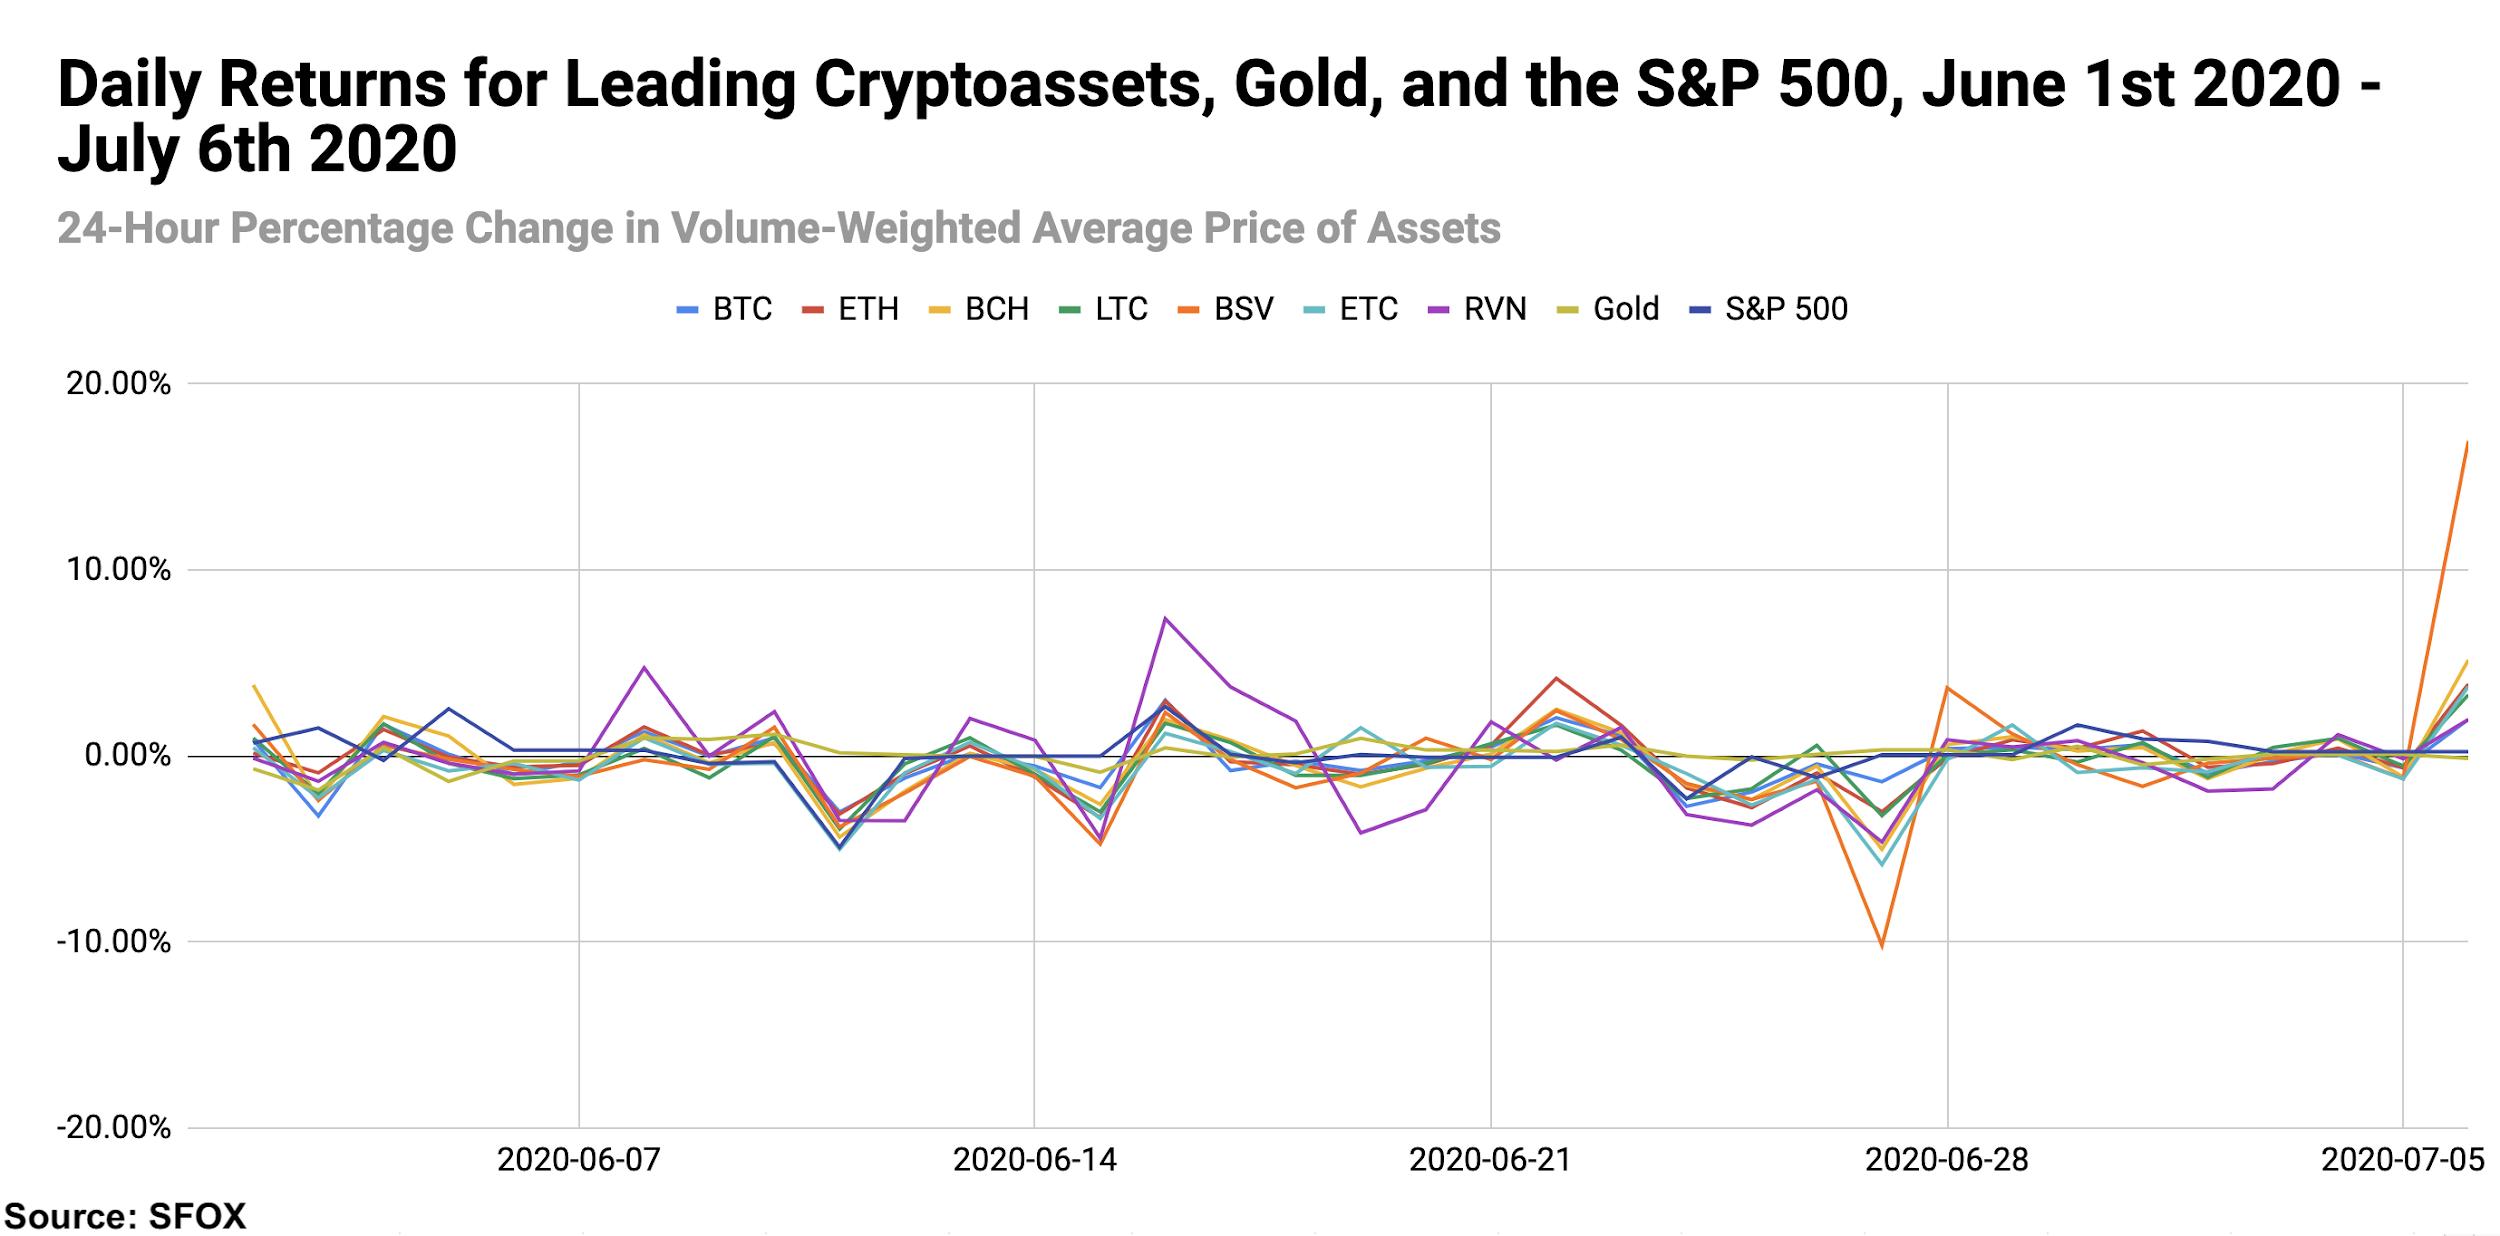 Bitcoin crypto S&P 500 gold daily returns data July 2020.